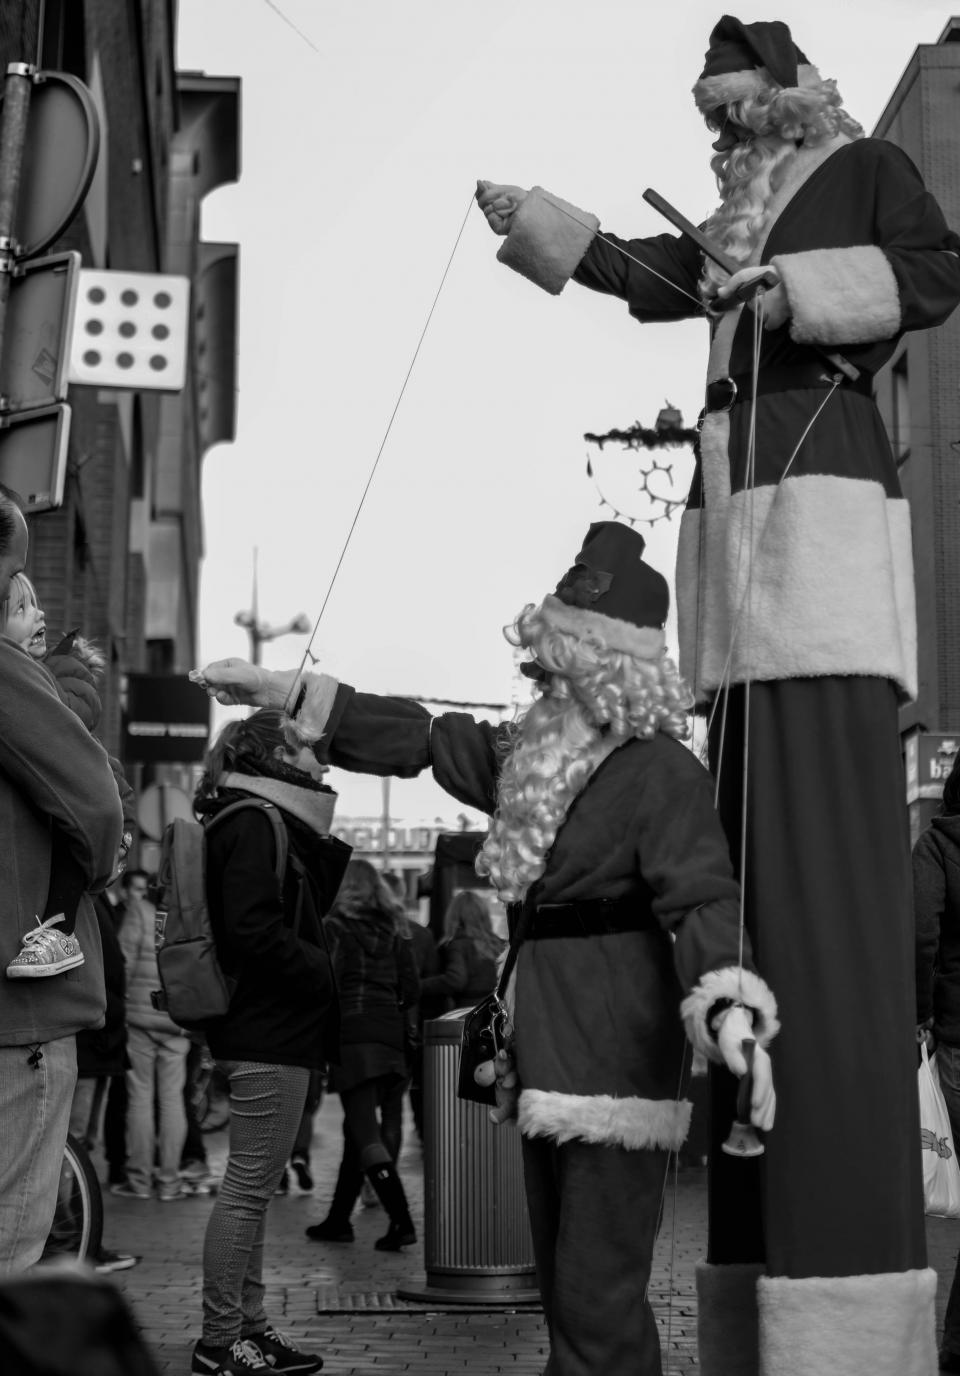 street stilts spectators santas people parade marionettes festival crowd christmas